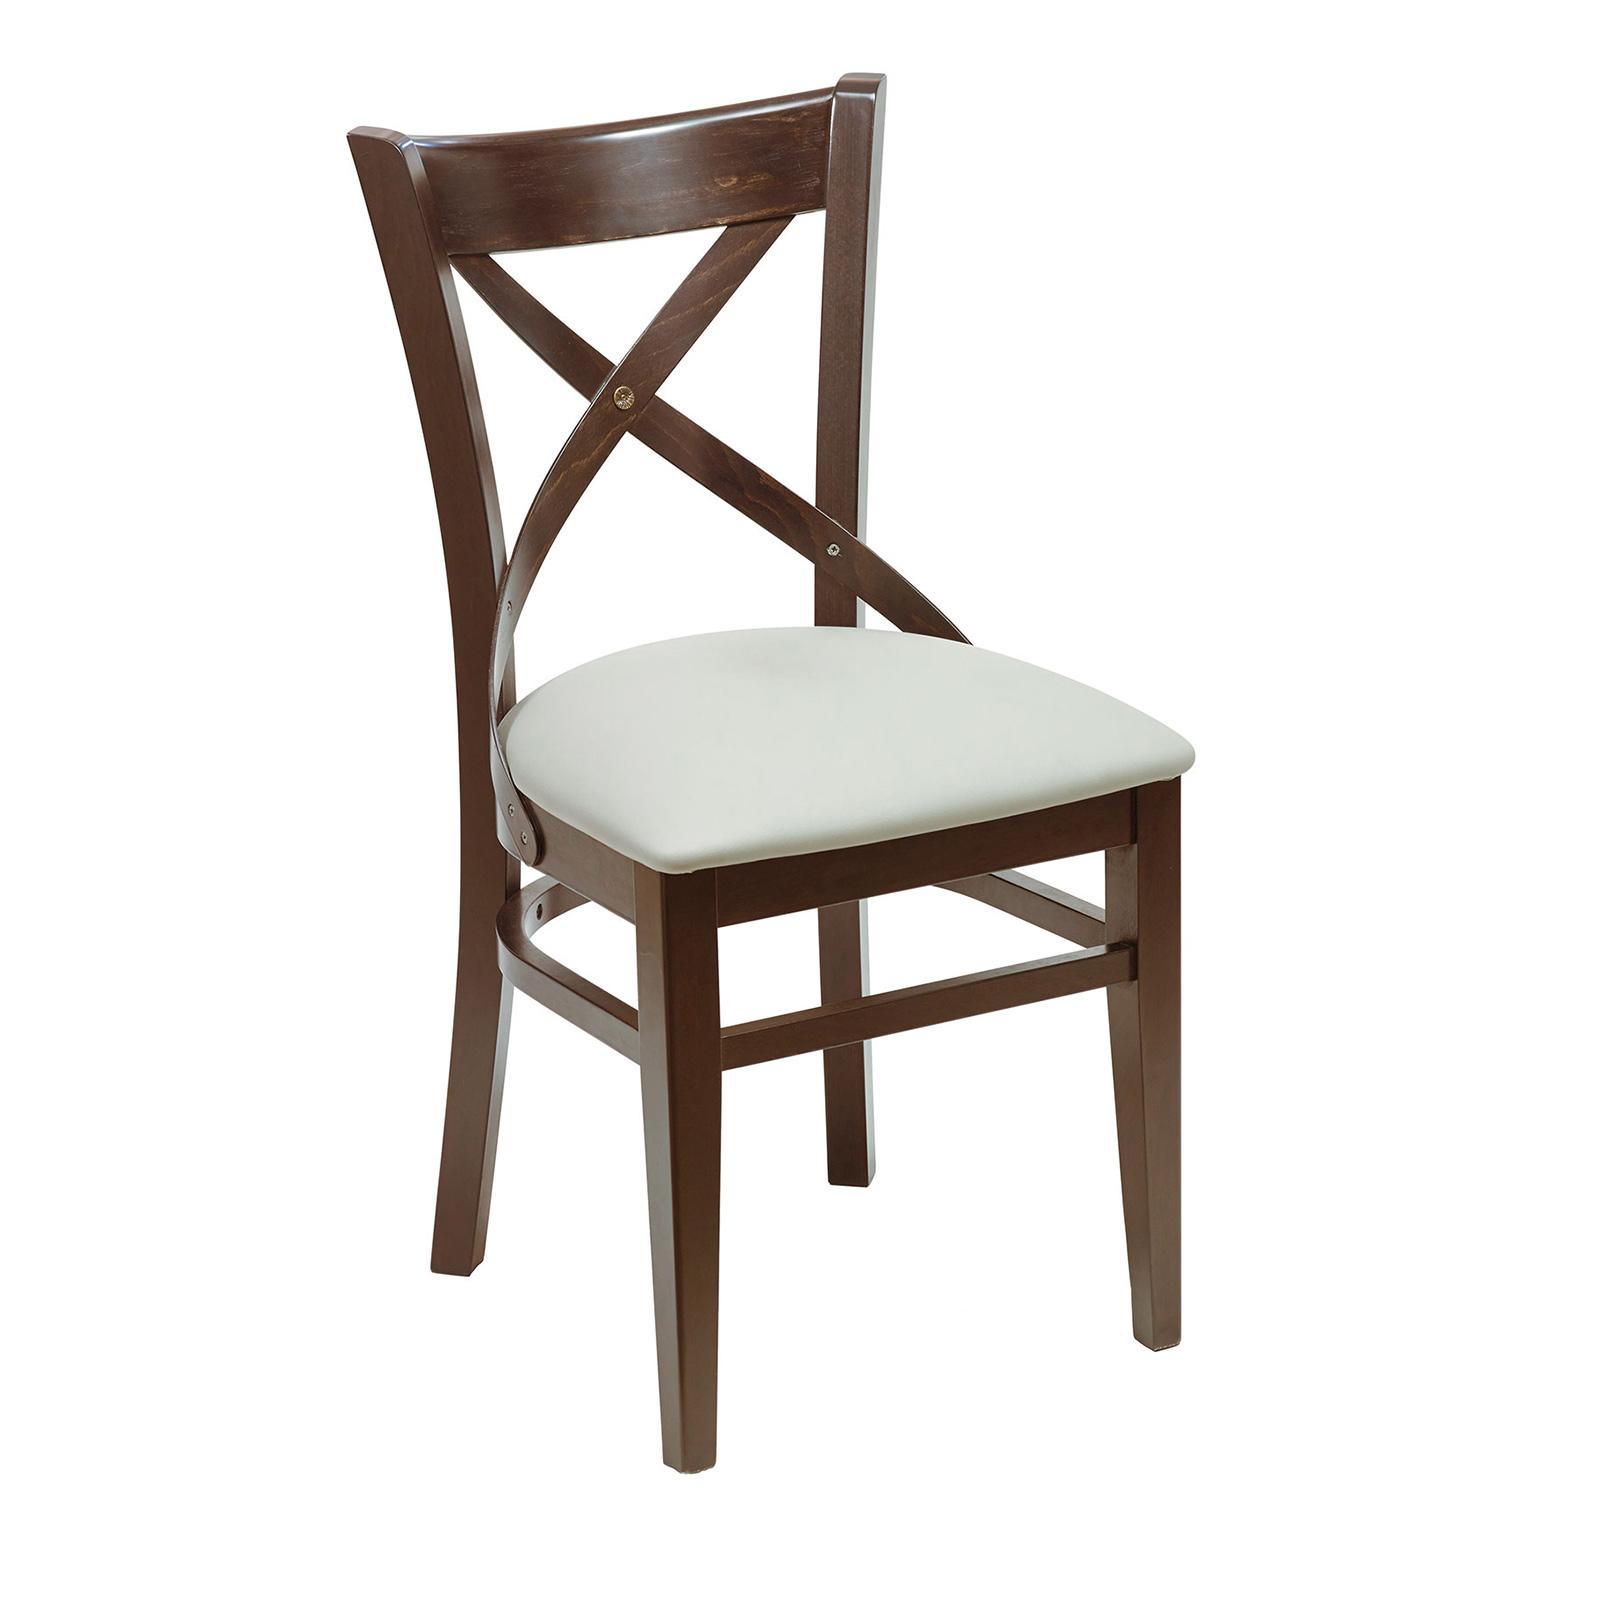 Florida Seating FLS-16S VS chair, side, indoor